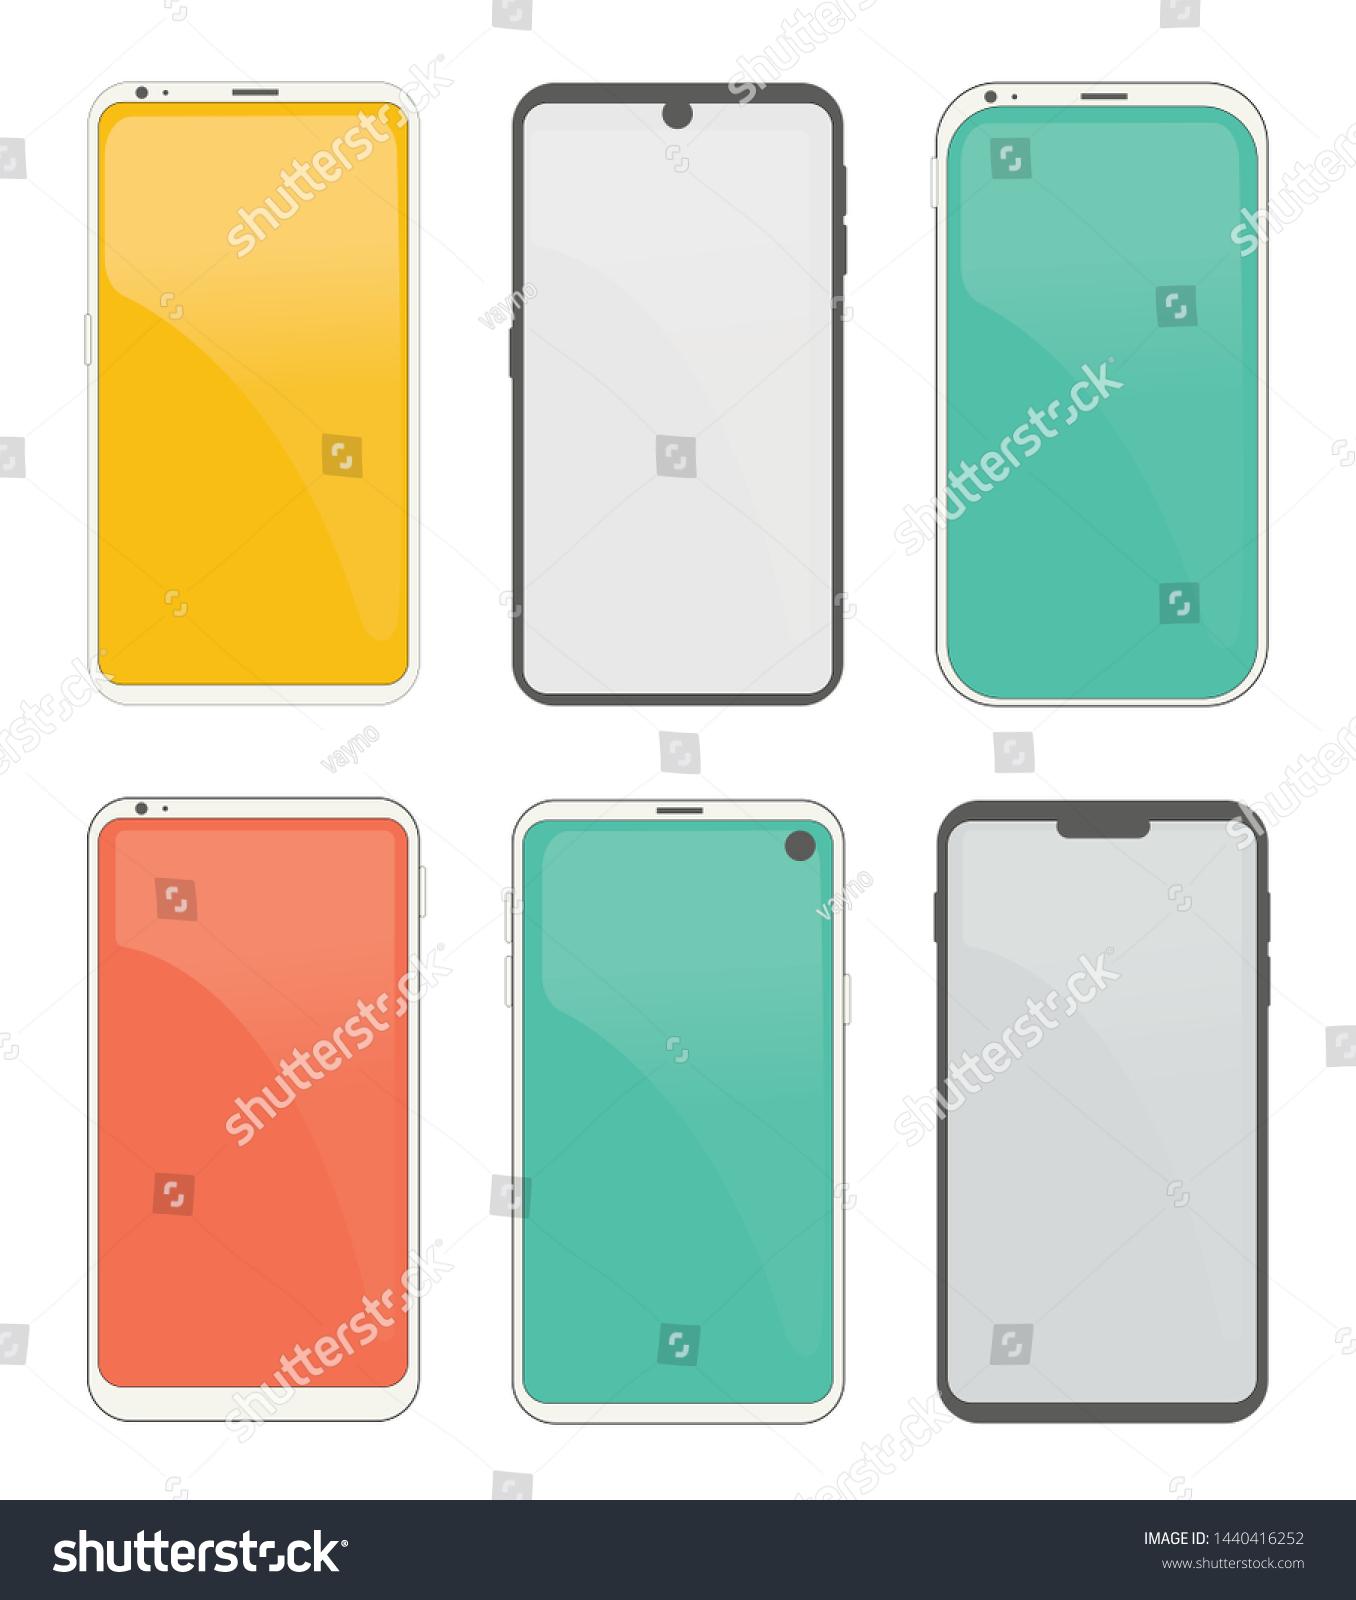 stock-vector--modern-smartphone-template